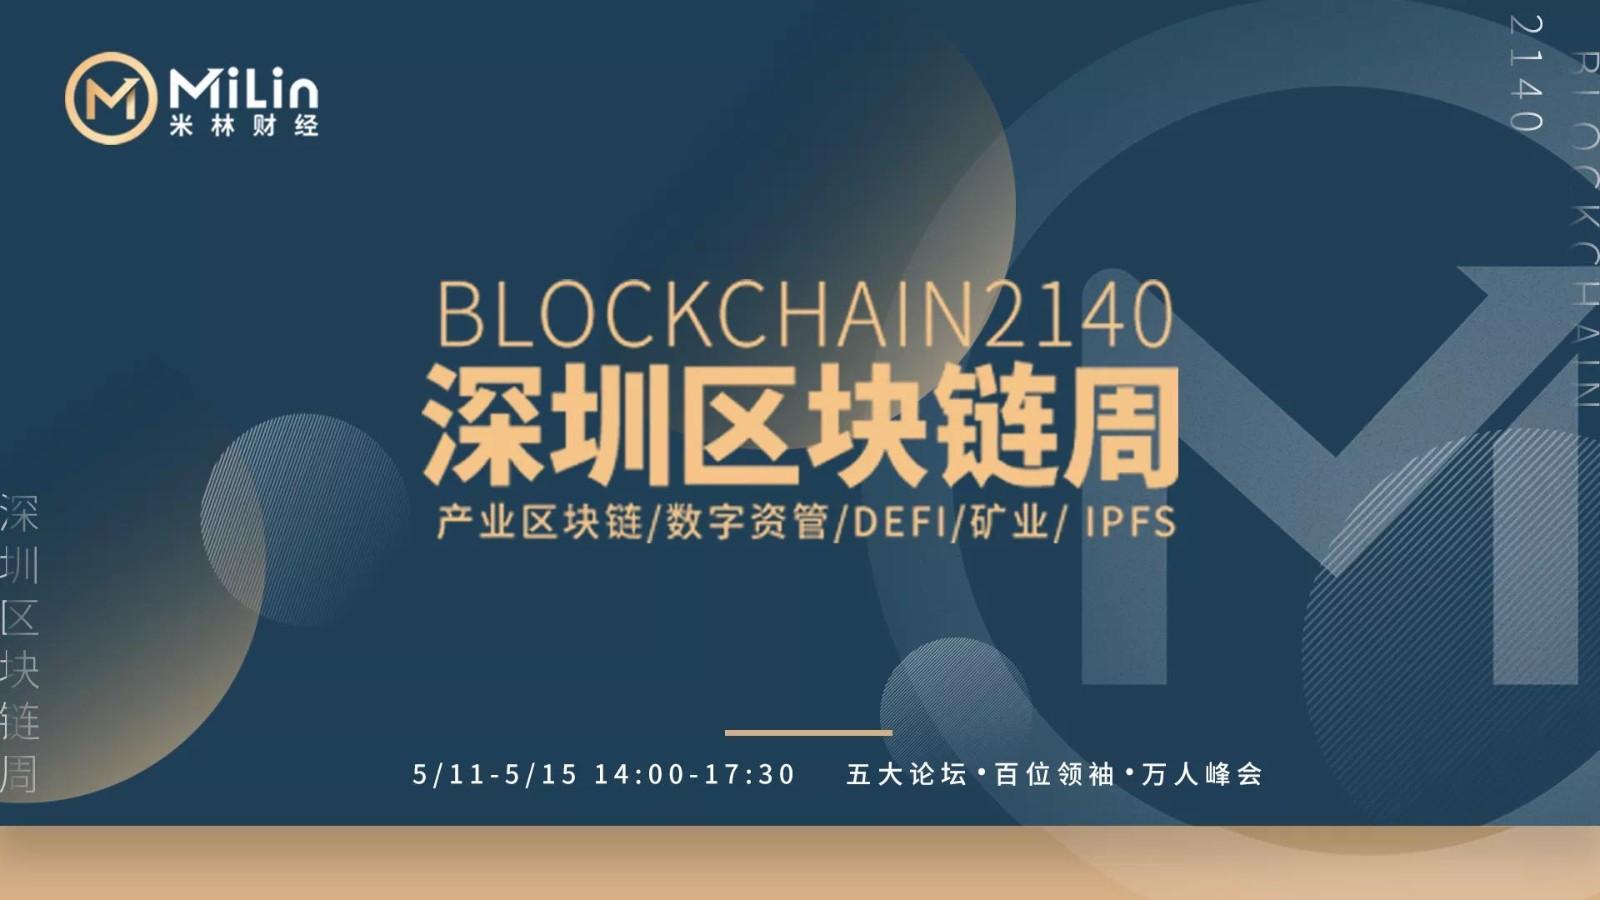 BLOCKCHAIN2140深圳区块链周